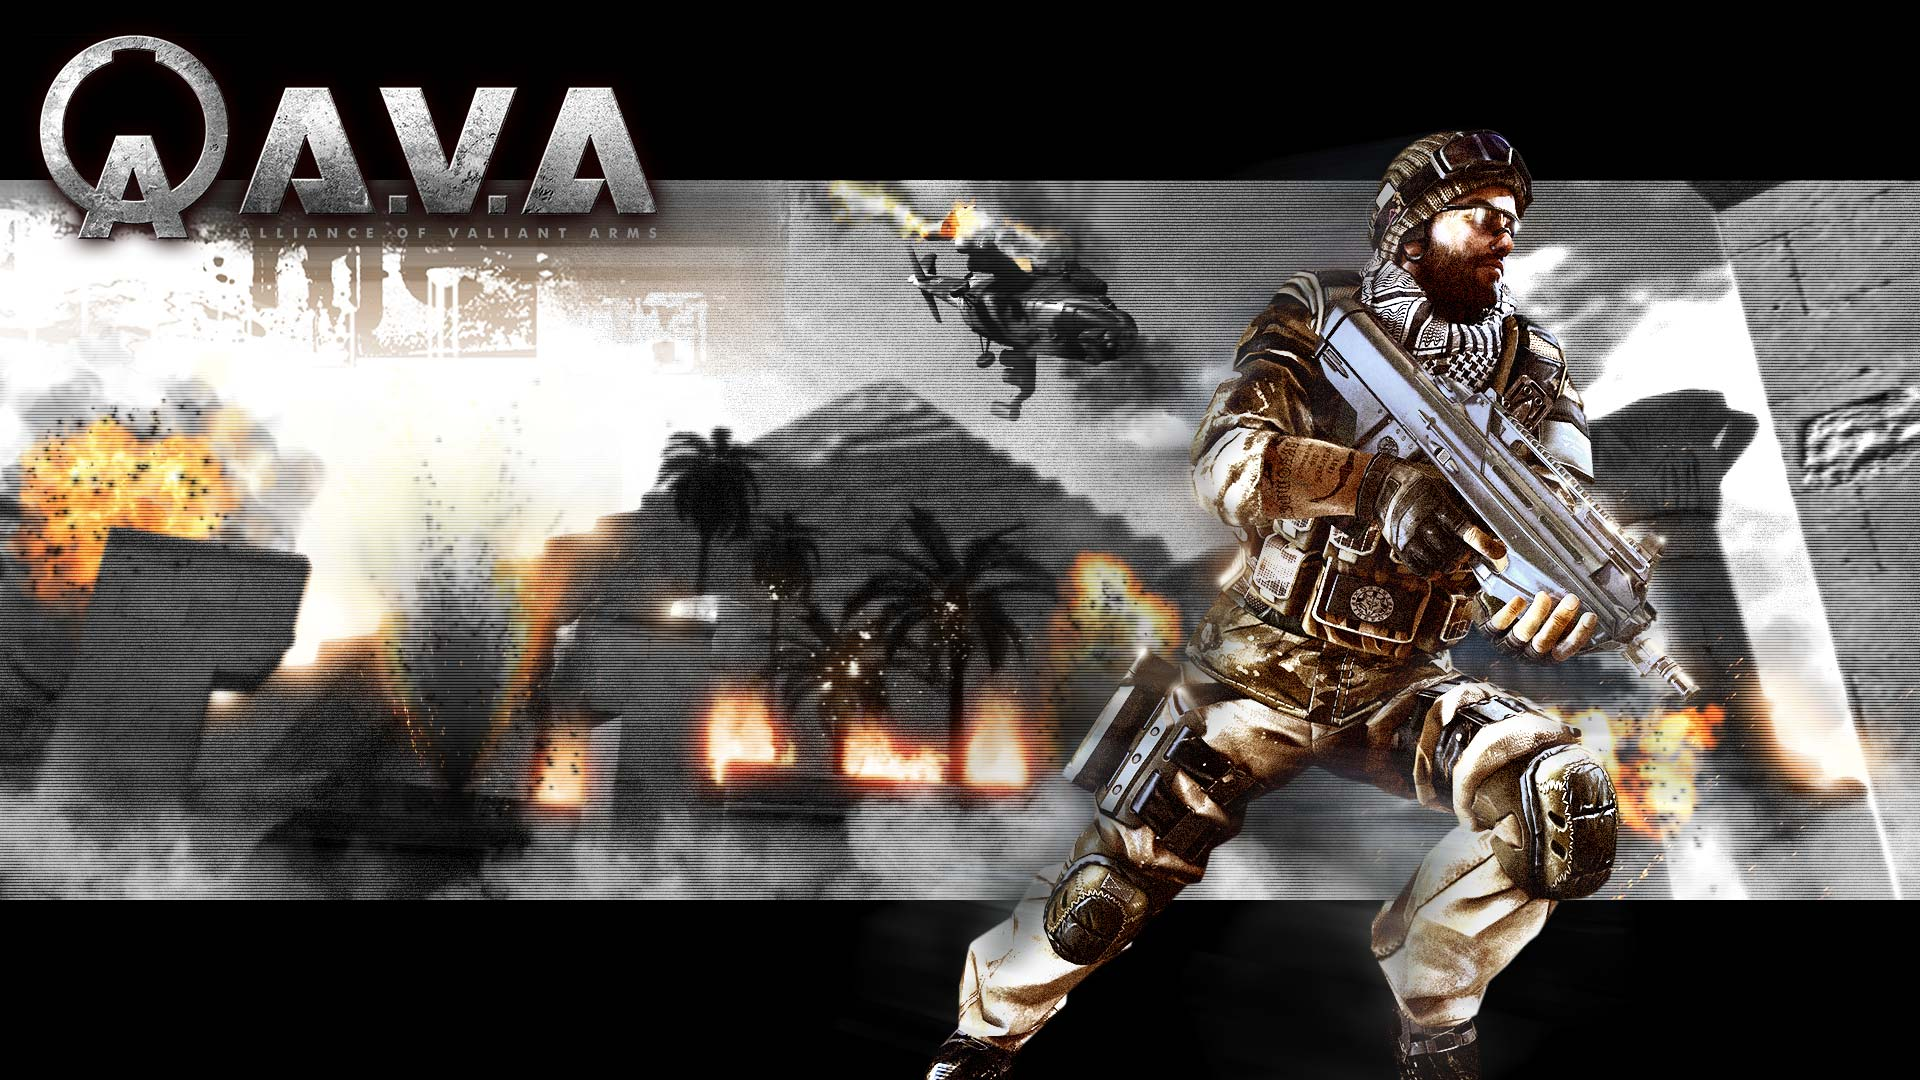 AVA Alliance of Valiant Arms Artwork 1.jpg